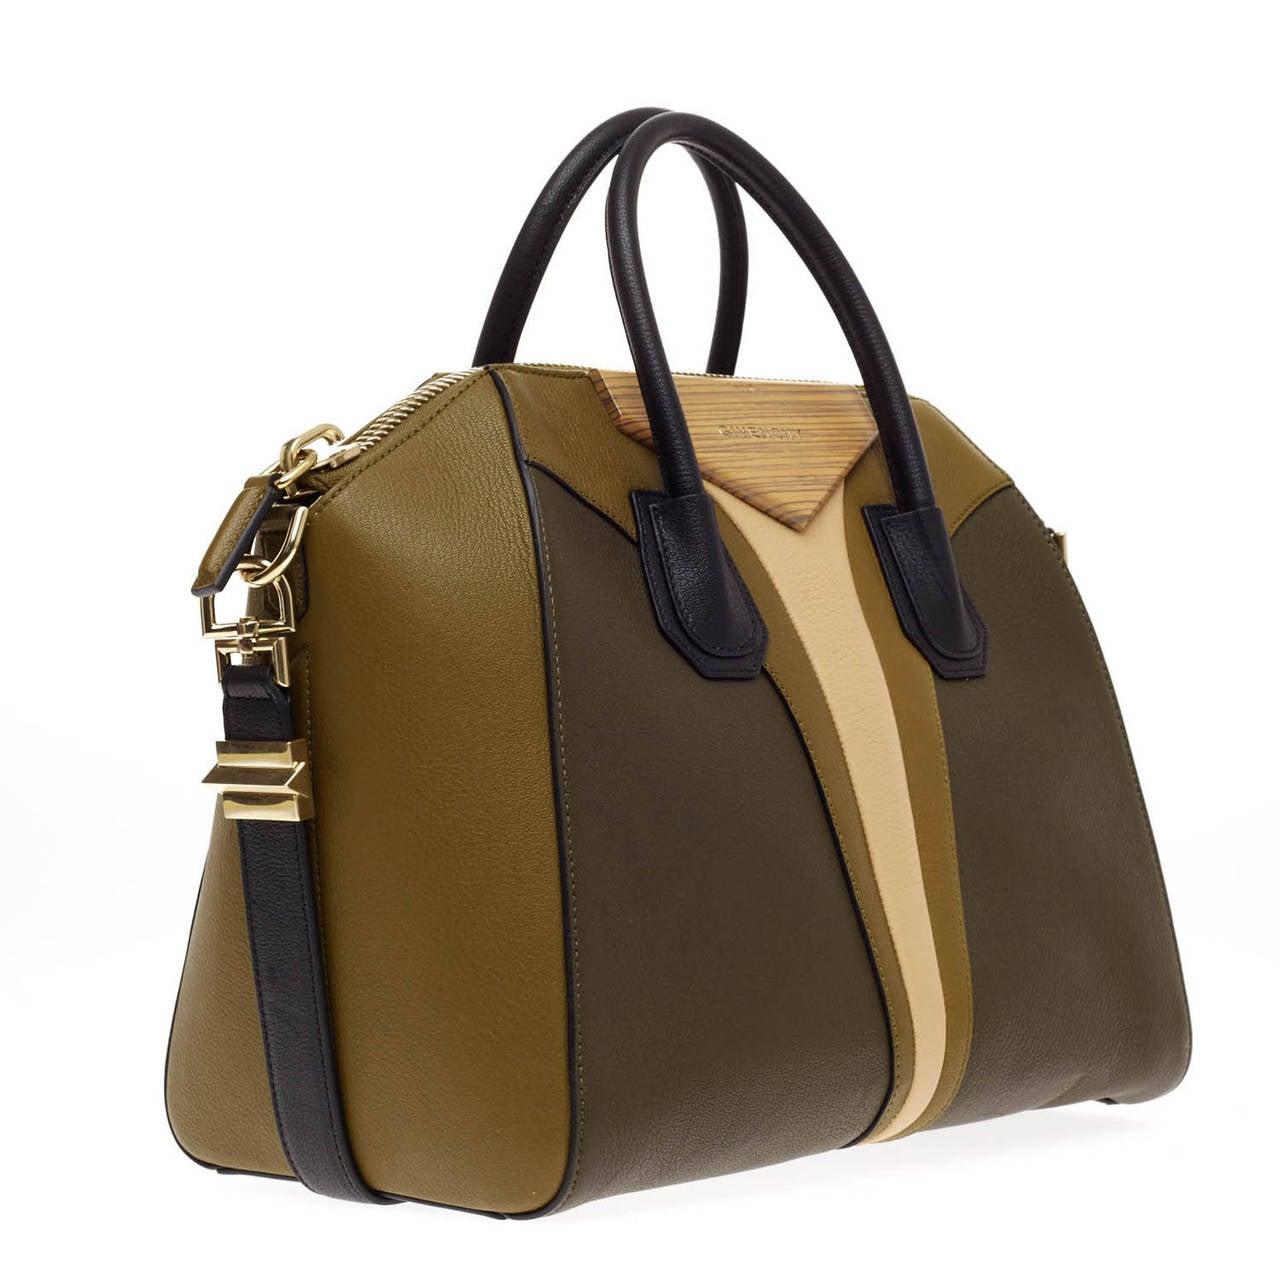 Givenchy Antigona Bag 2013 Givenchy Antigona Bag